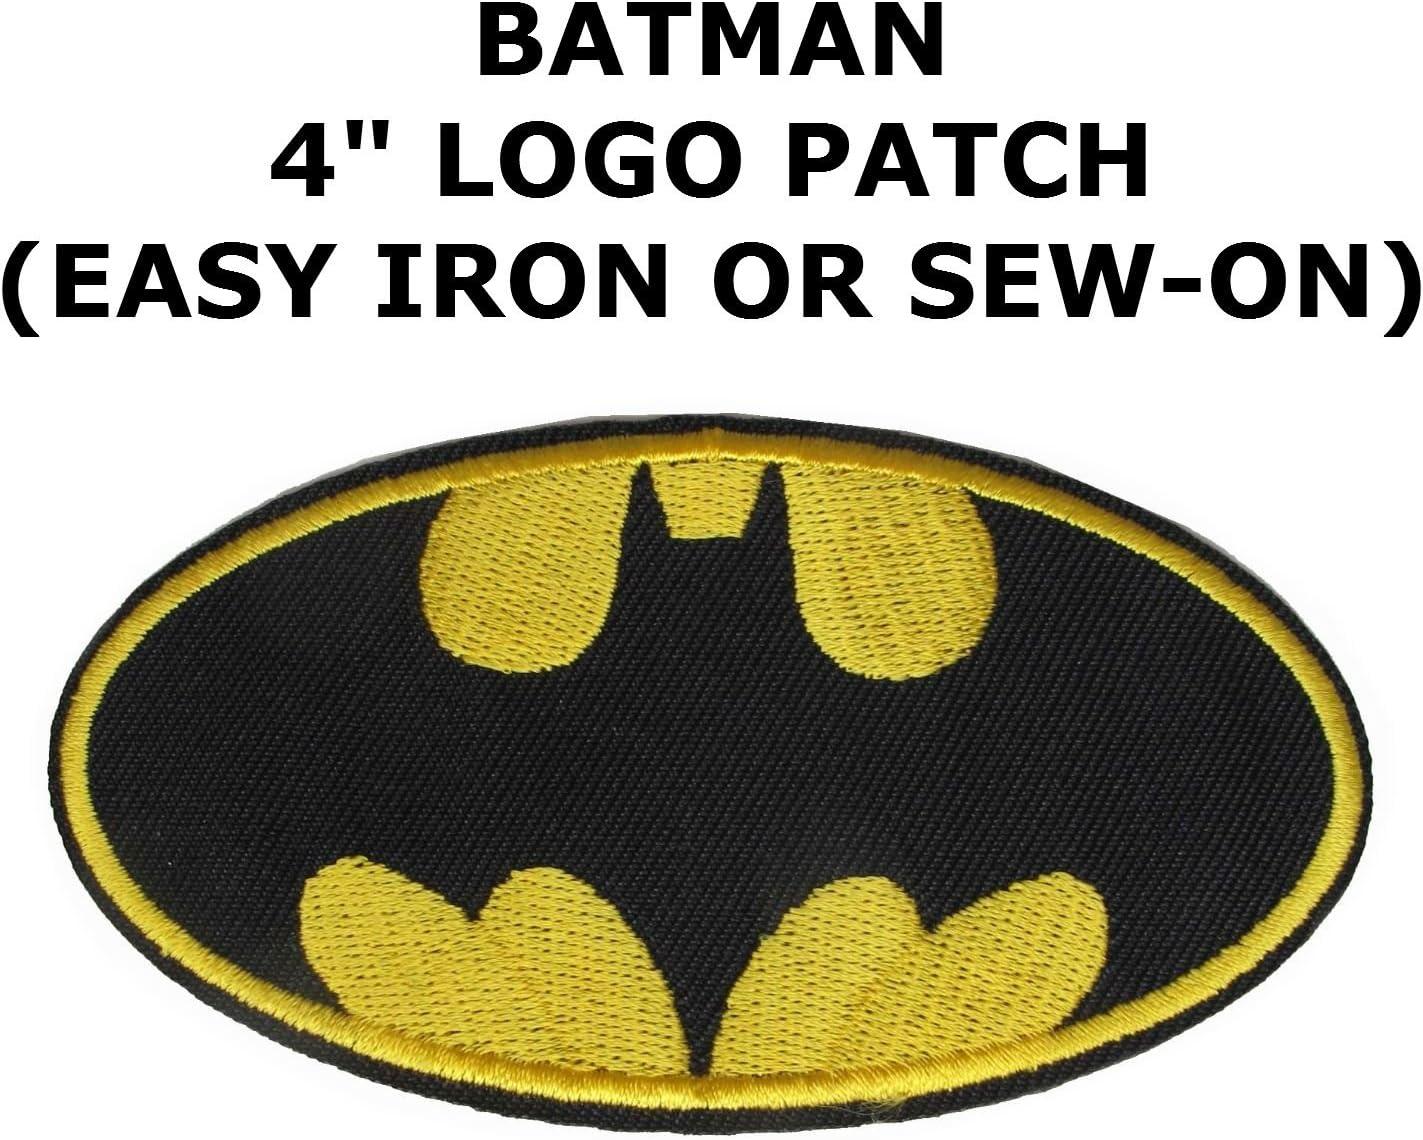 Athena Super Heros Dc Batman Bat Logo Facile Fer A Repasser Ou A